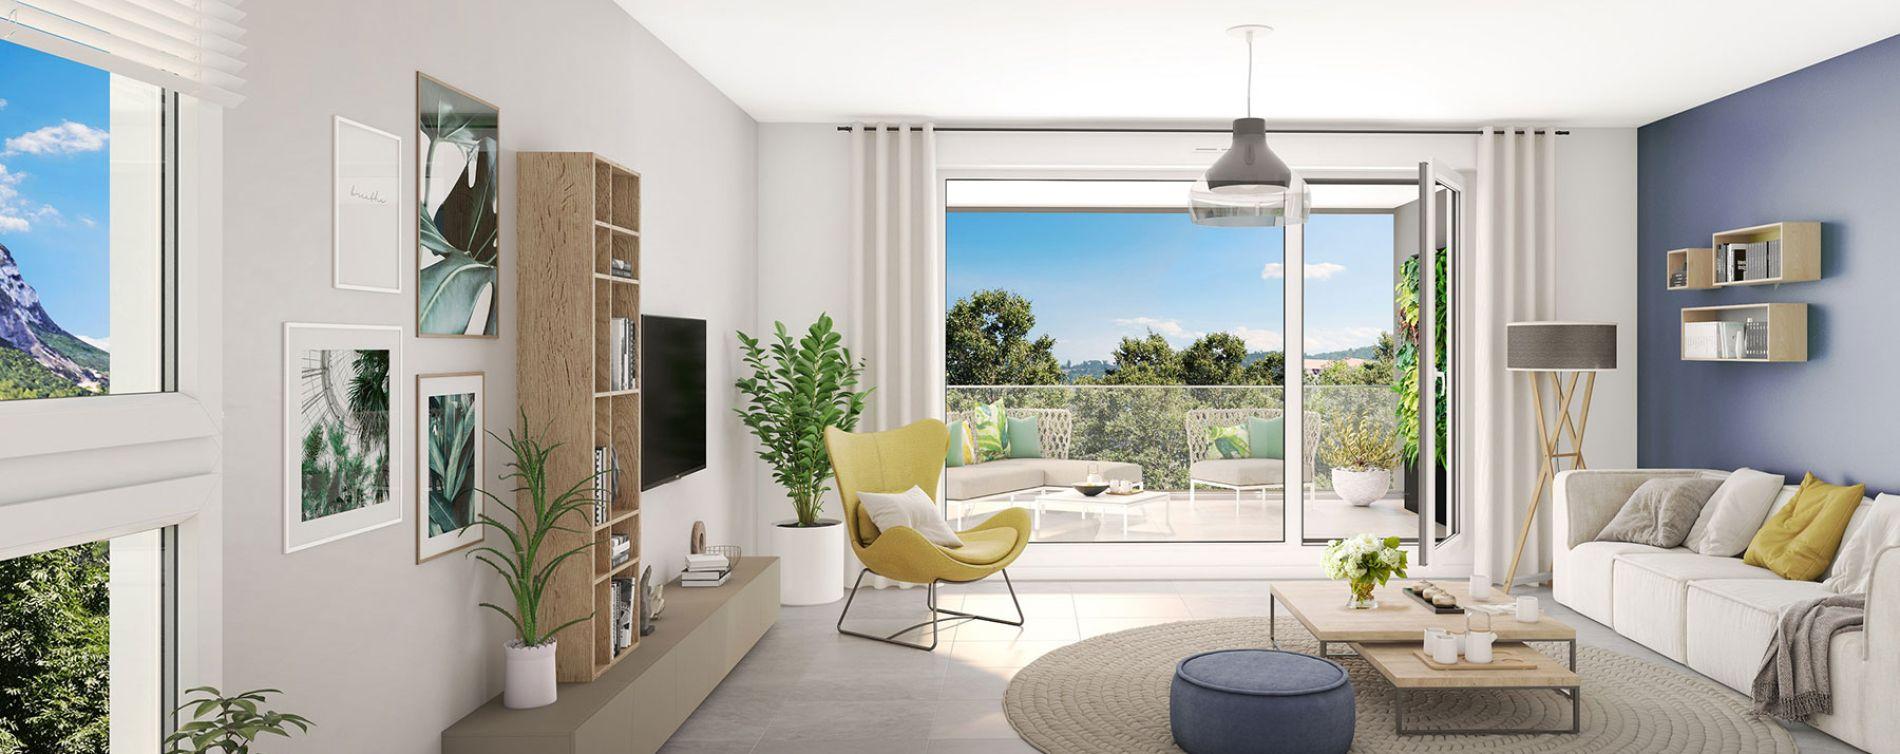 Annemasse : programme immobilier neuve « Duomo » (2)